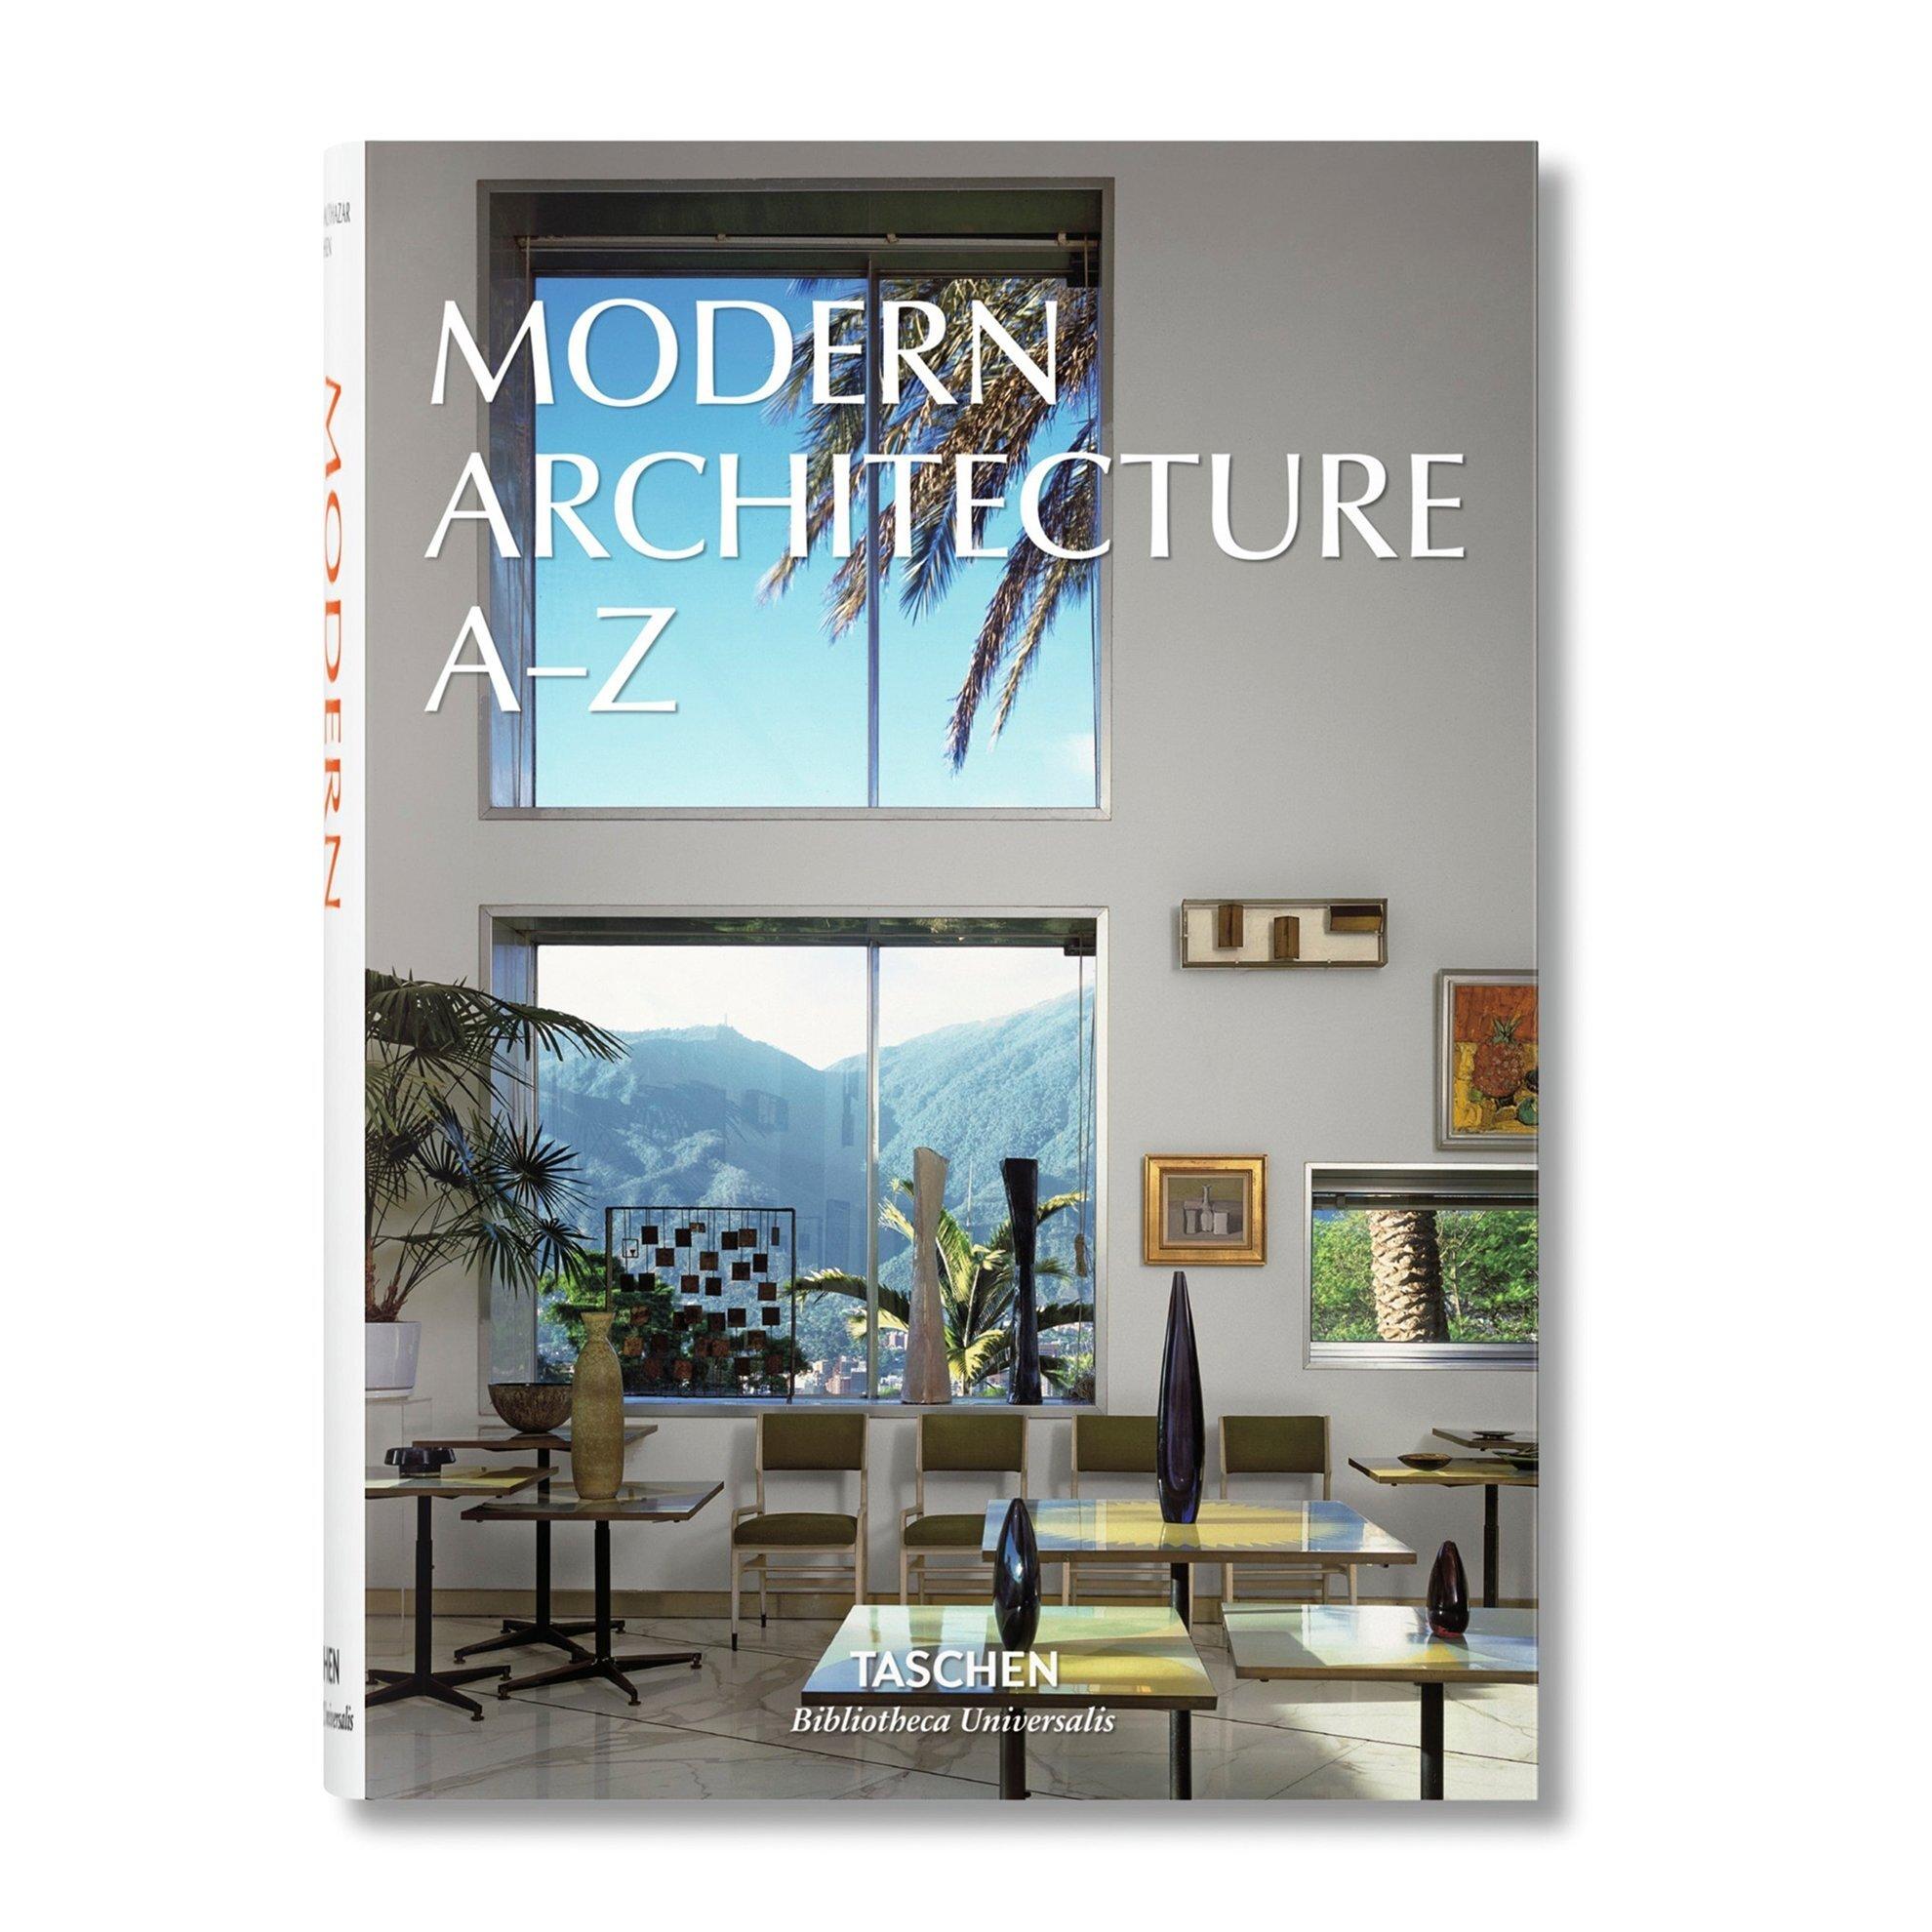 Book - Modern Architecture A-Z